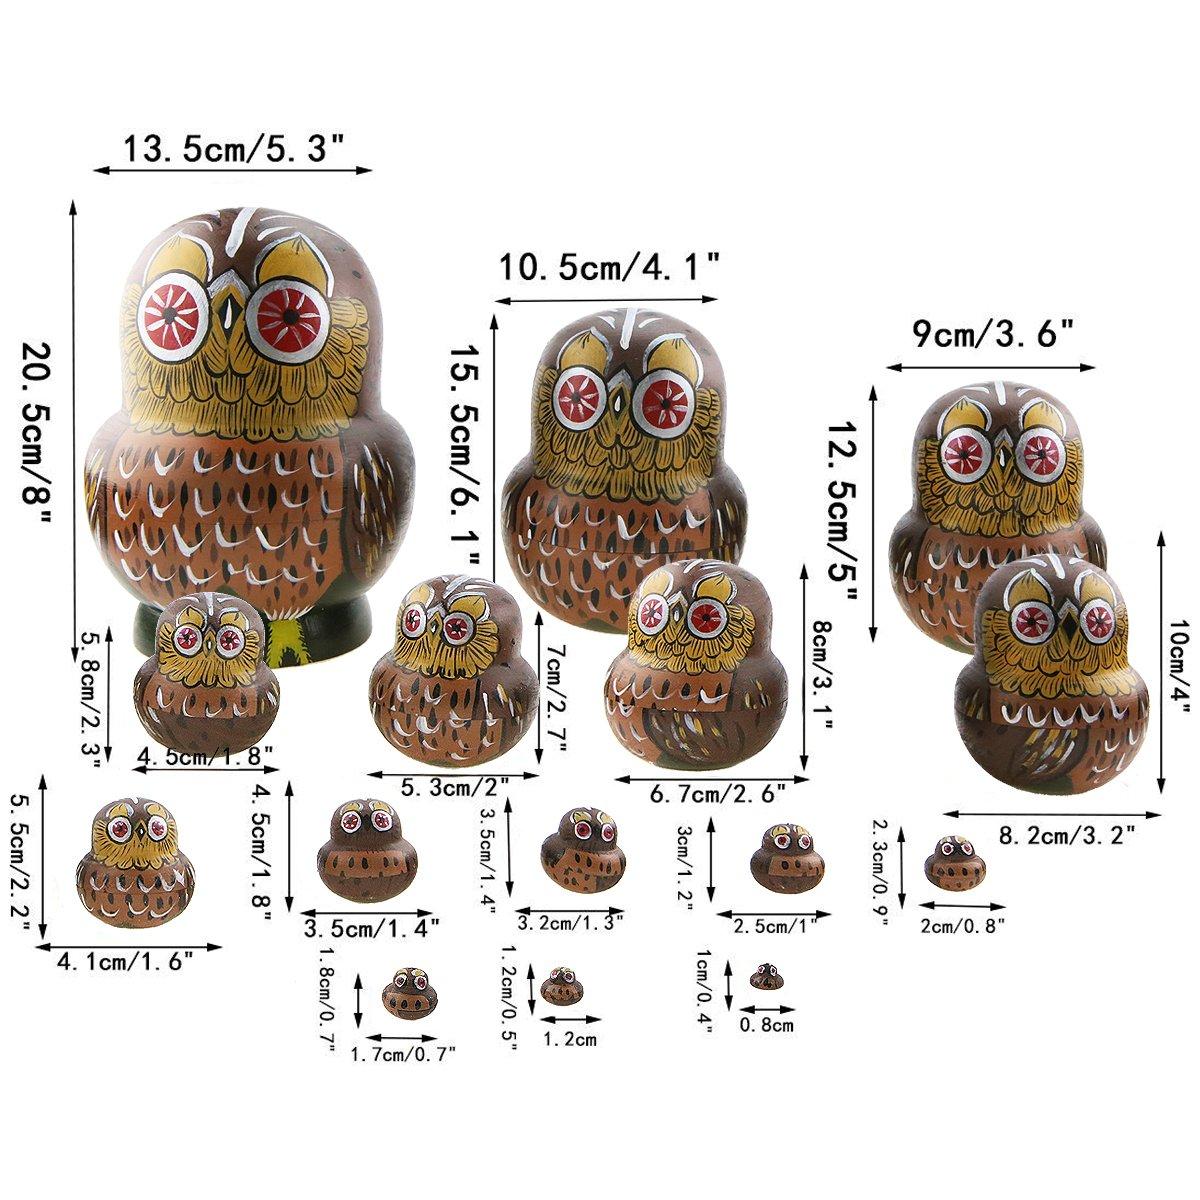 Winterworm Set of 15 Pieces Cartoon Brown Owl Russian Handmade Wooden Nesting Dolls Matryoshka Dolls for Birthday Christmas New Year Gift Home Decoration Kids Toy by Winterworm (Image #5)